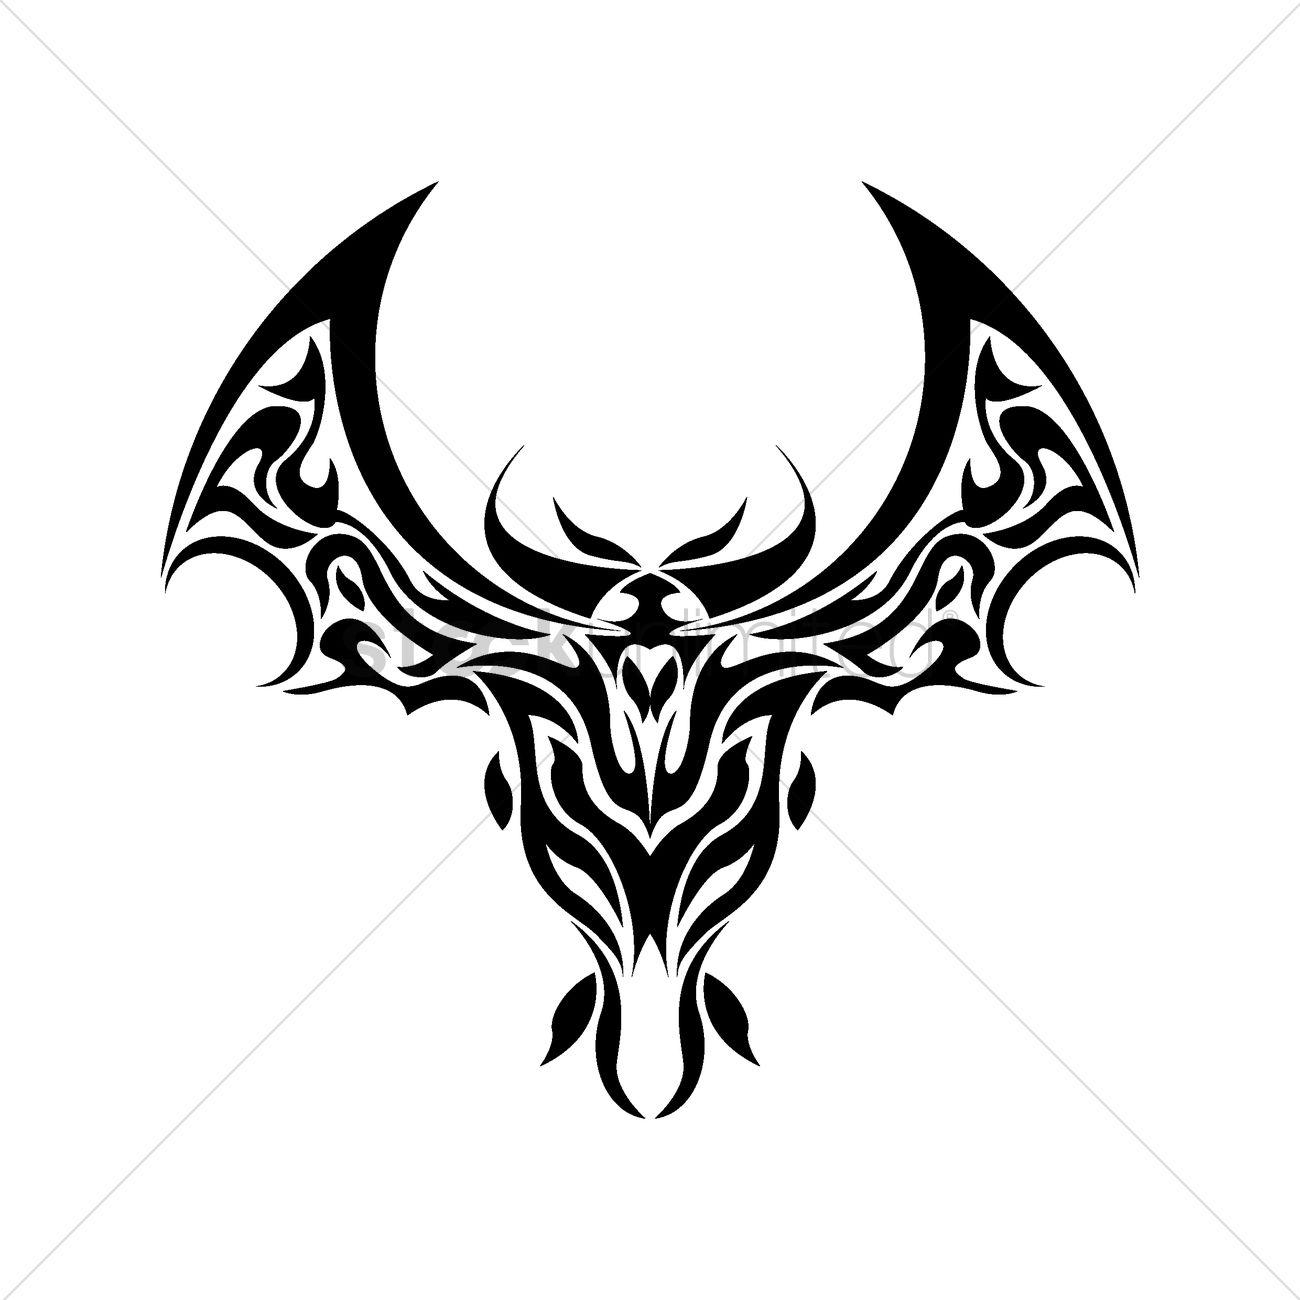 bat tattoo design vector image 1435573 stockunlimited rh stockunlimited com vampire bat tattoo designs cute bat tattoo designs